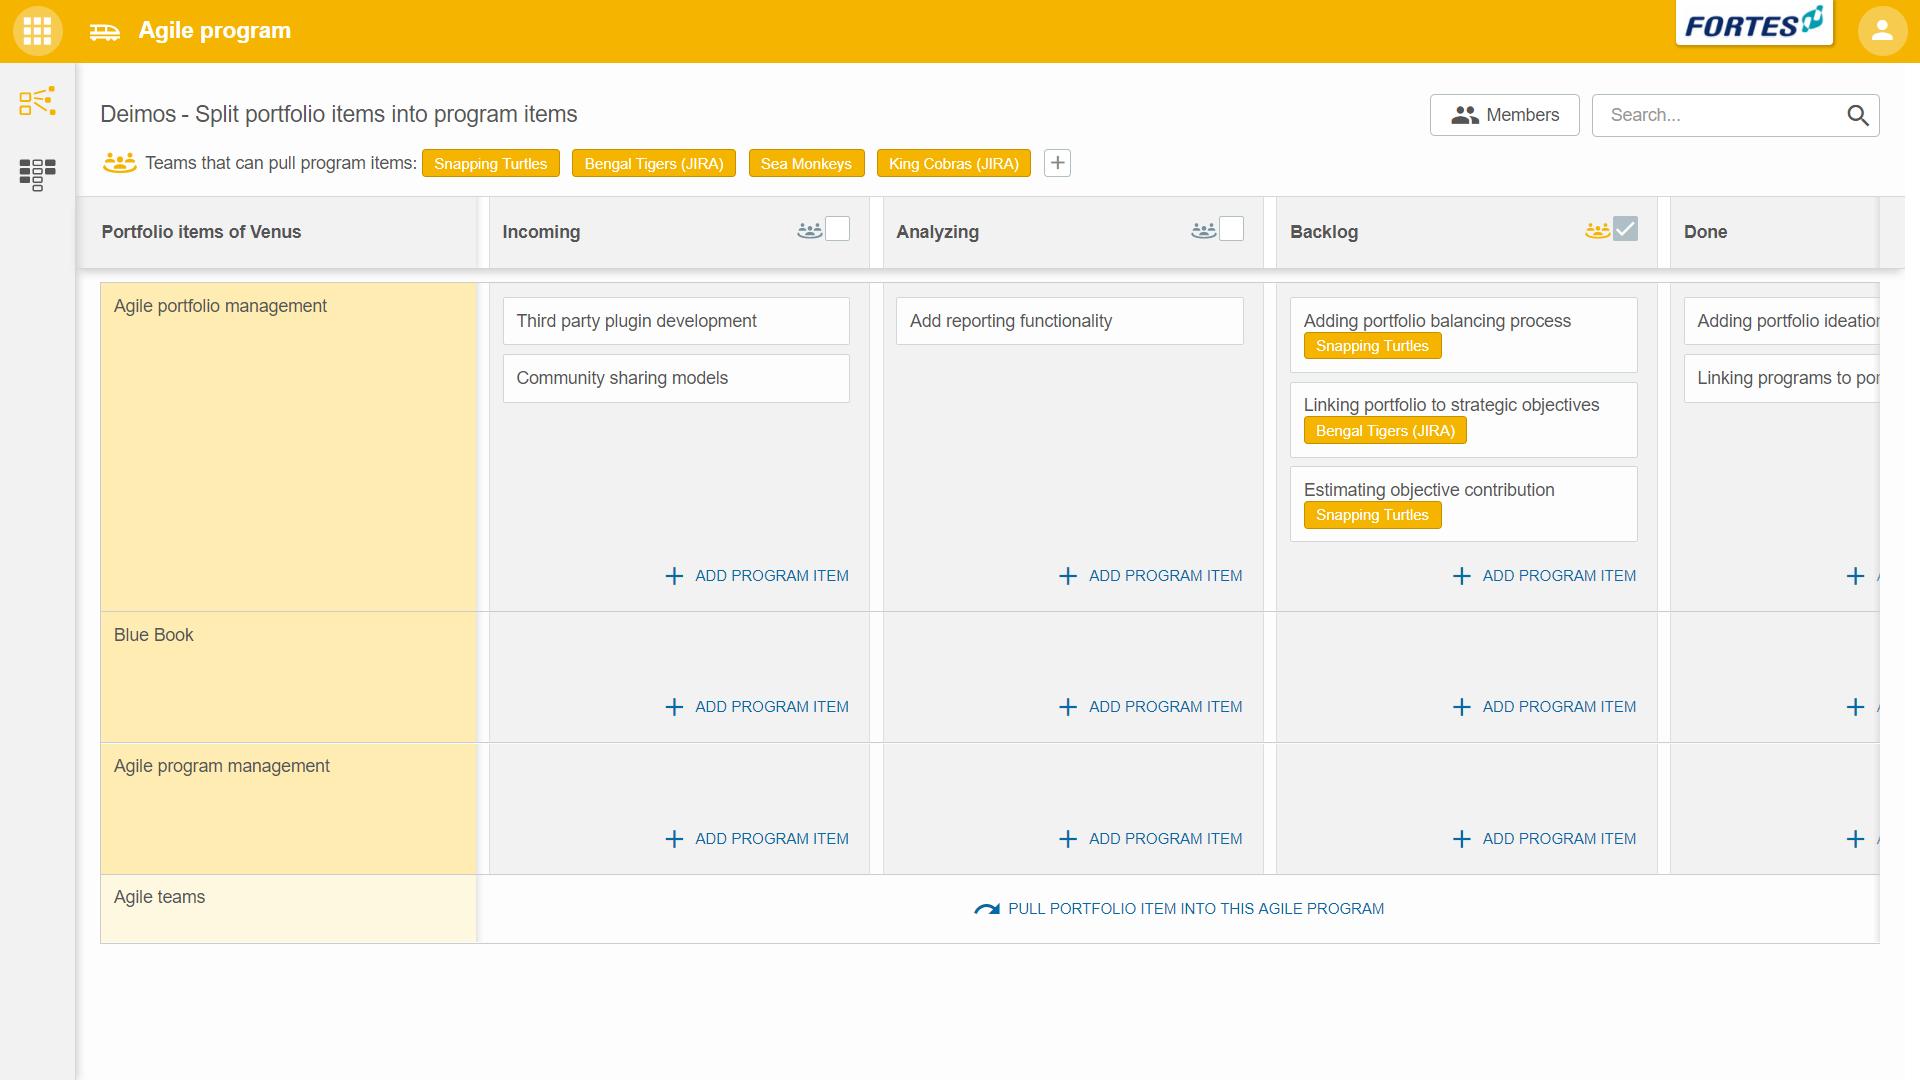 Scaled agile app Fortes Change Cloud